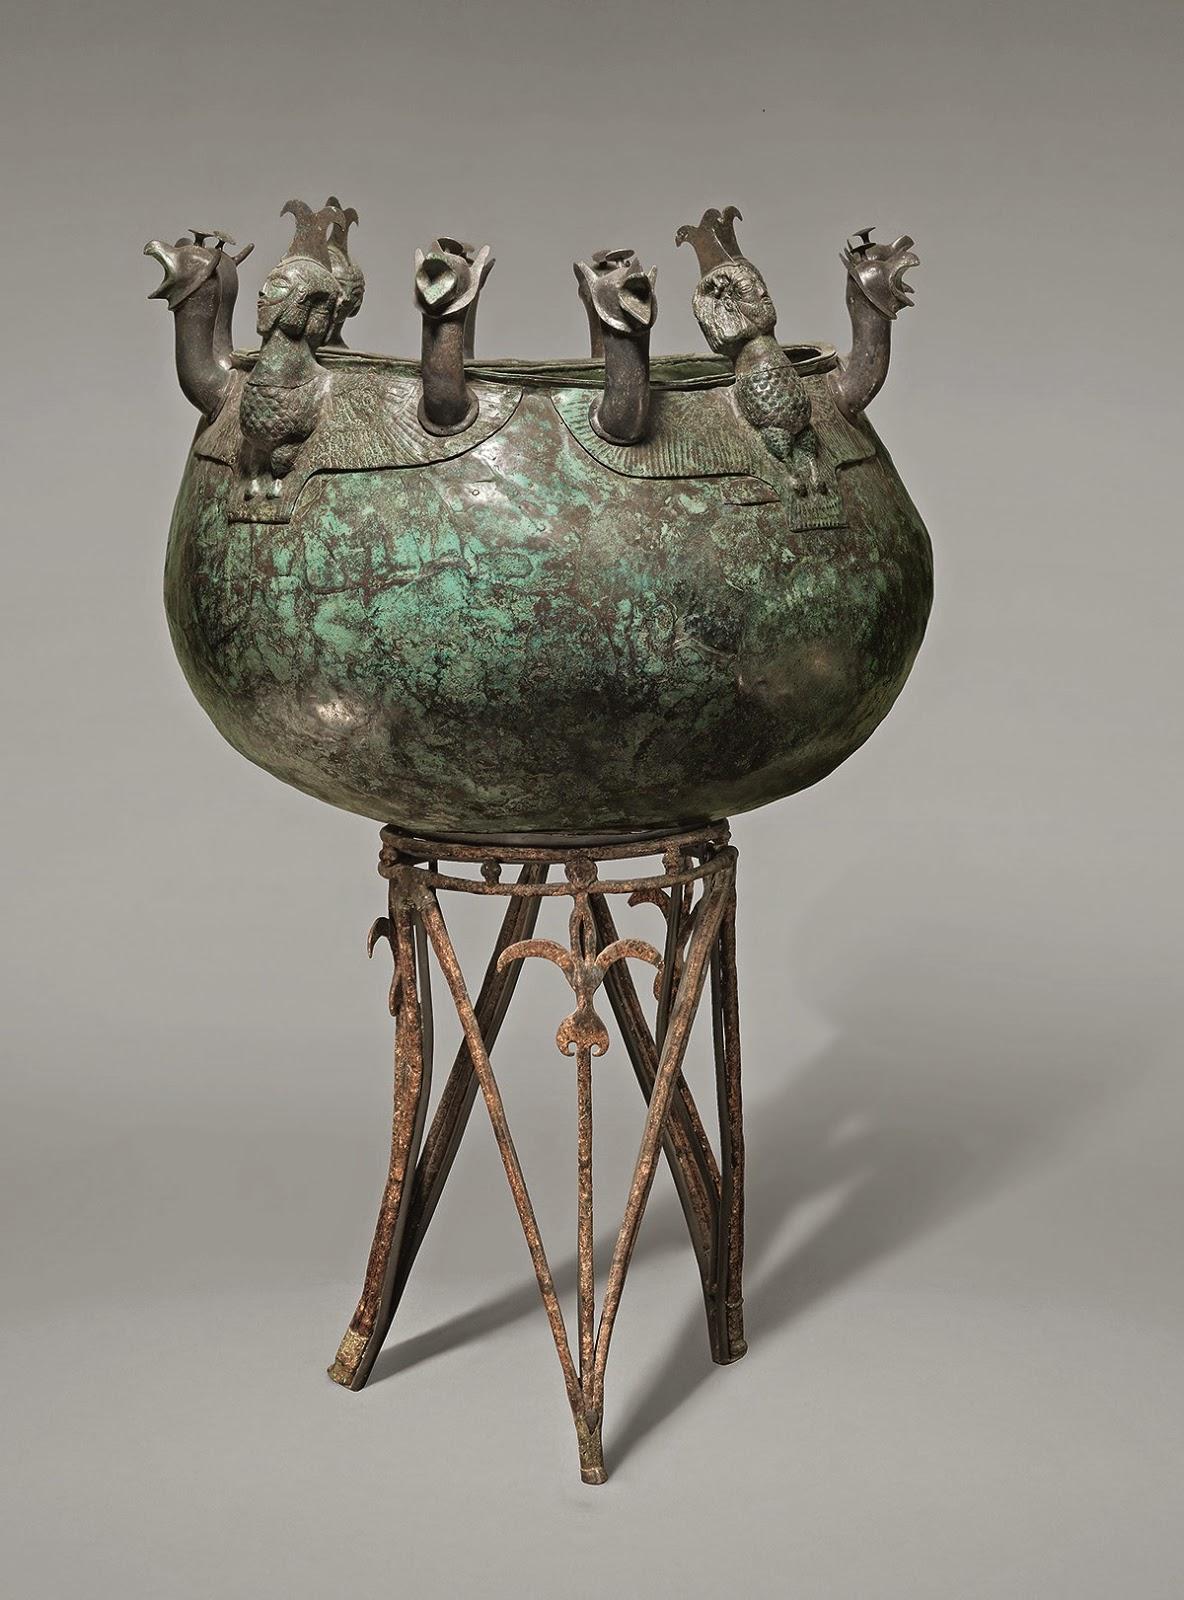 Hestia's Cauldron